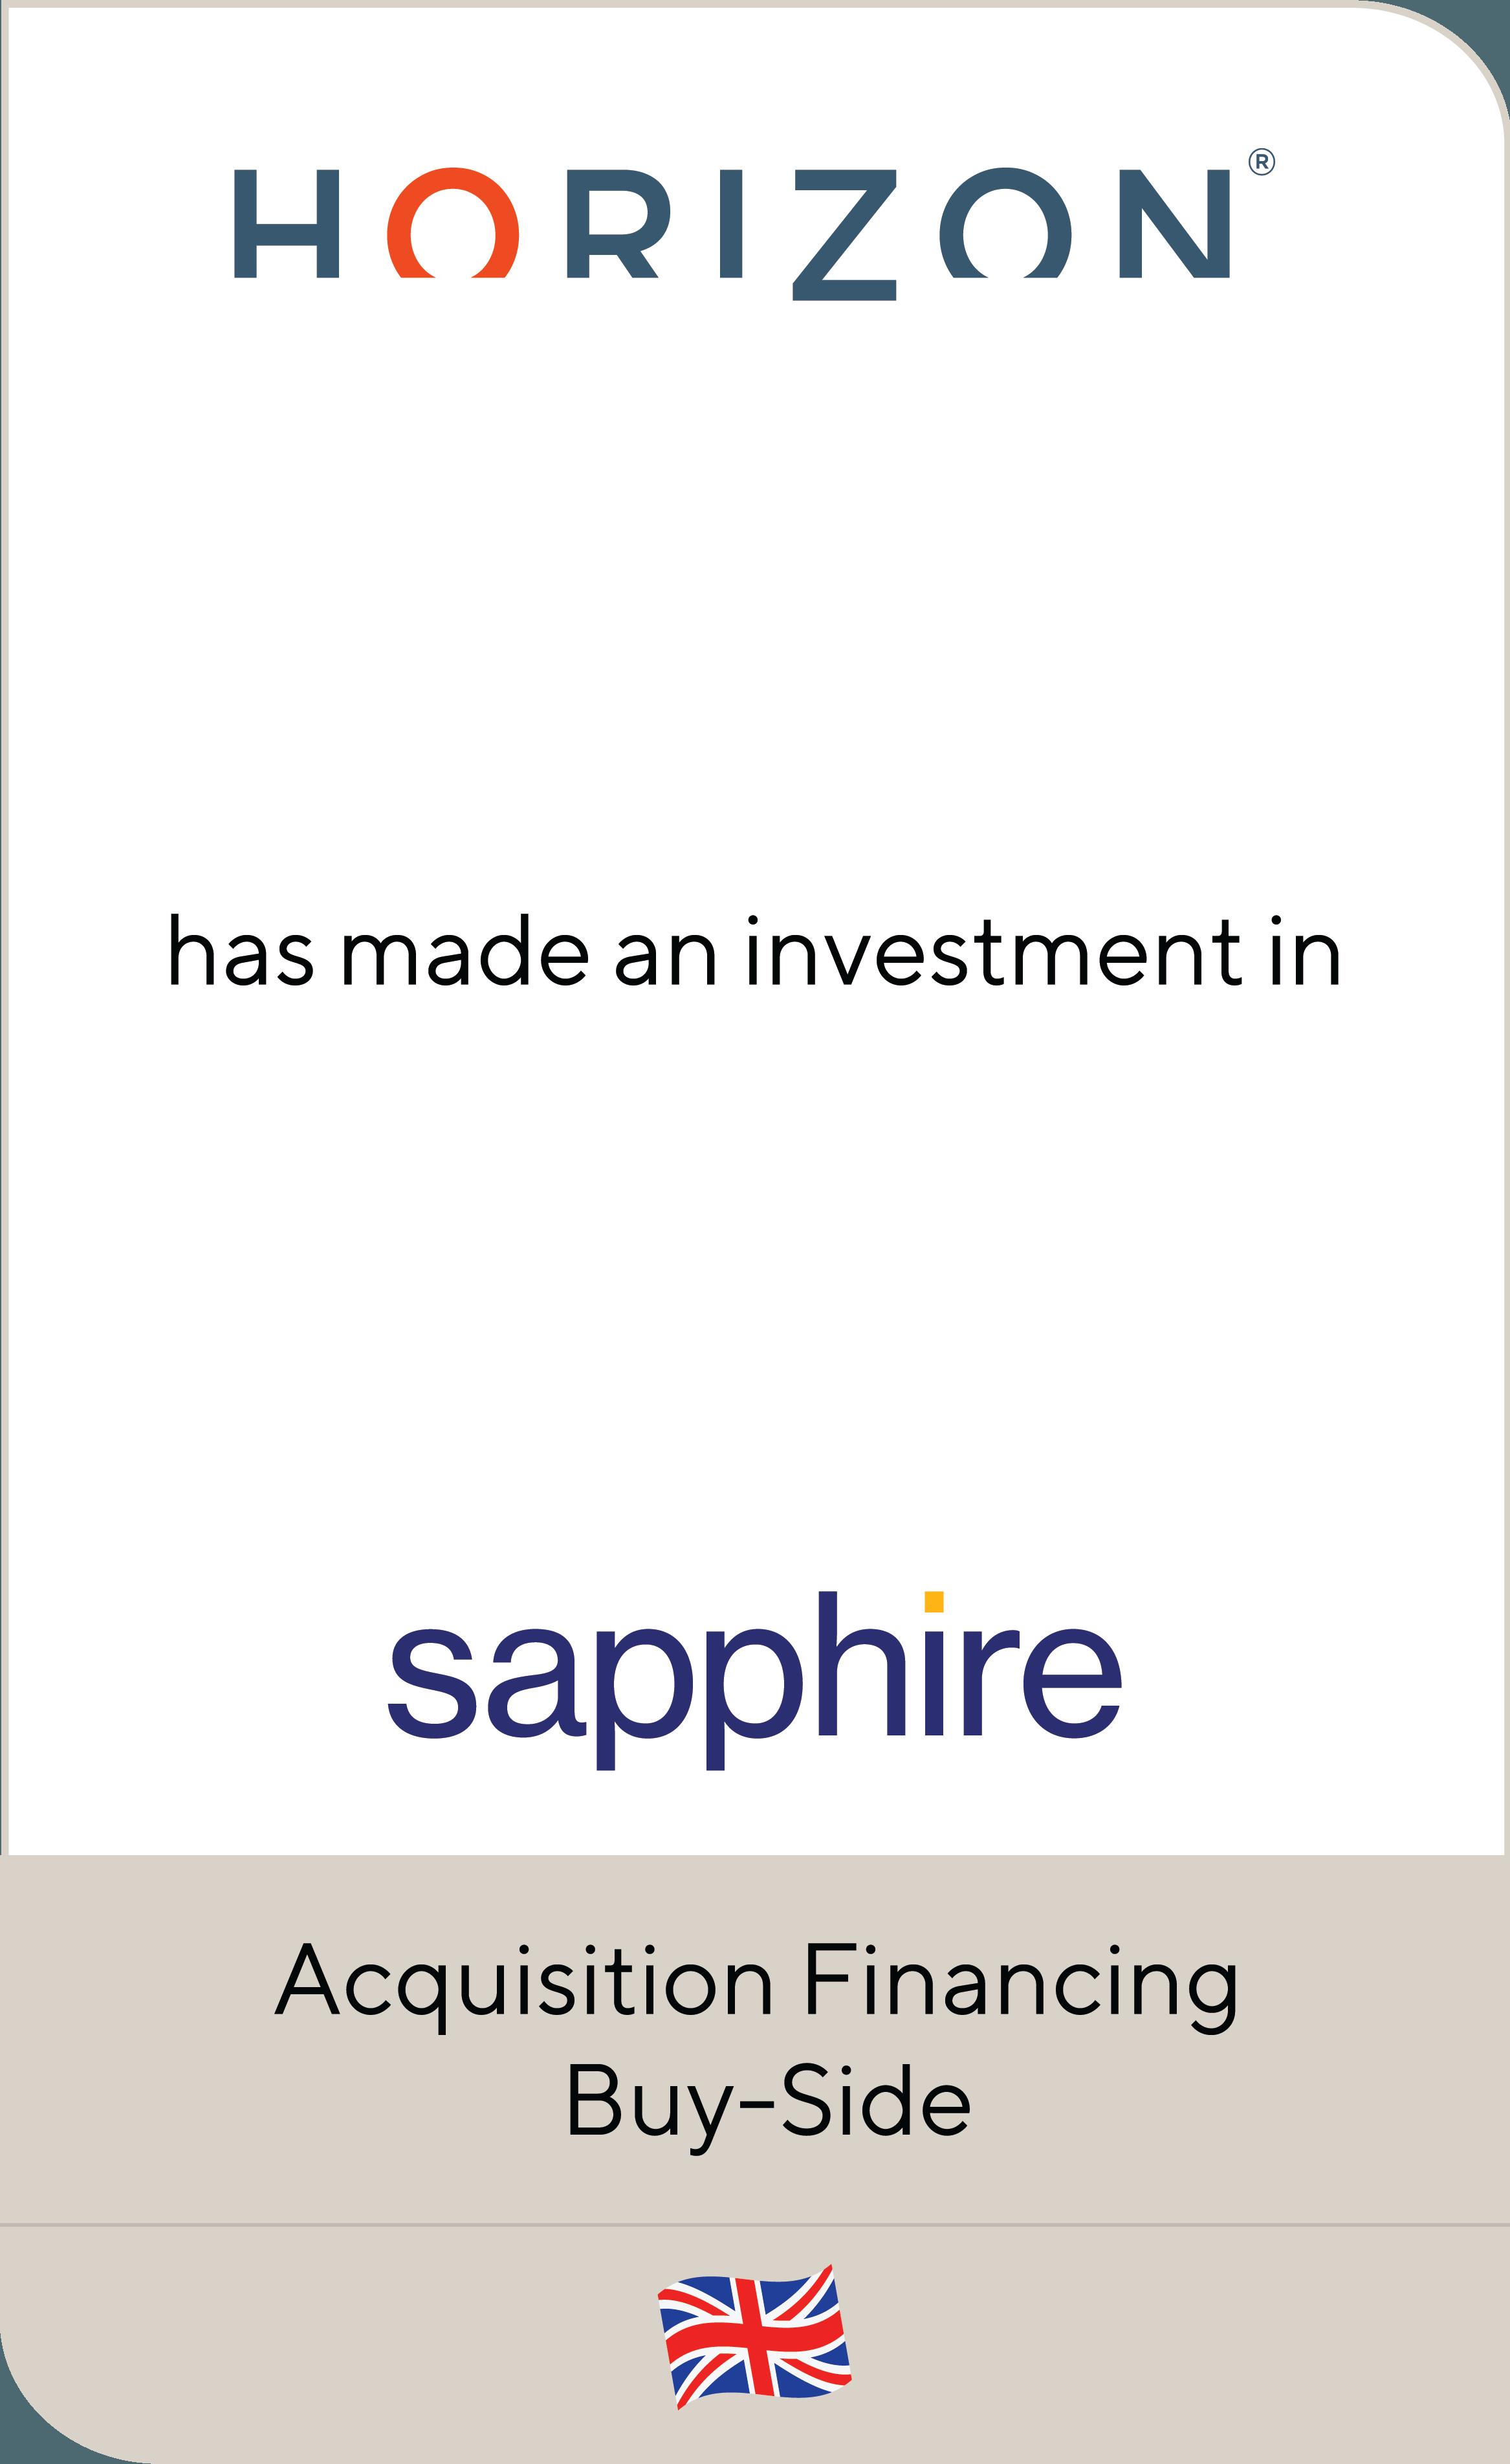 Horizon Capital Sapphire 2019